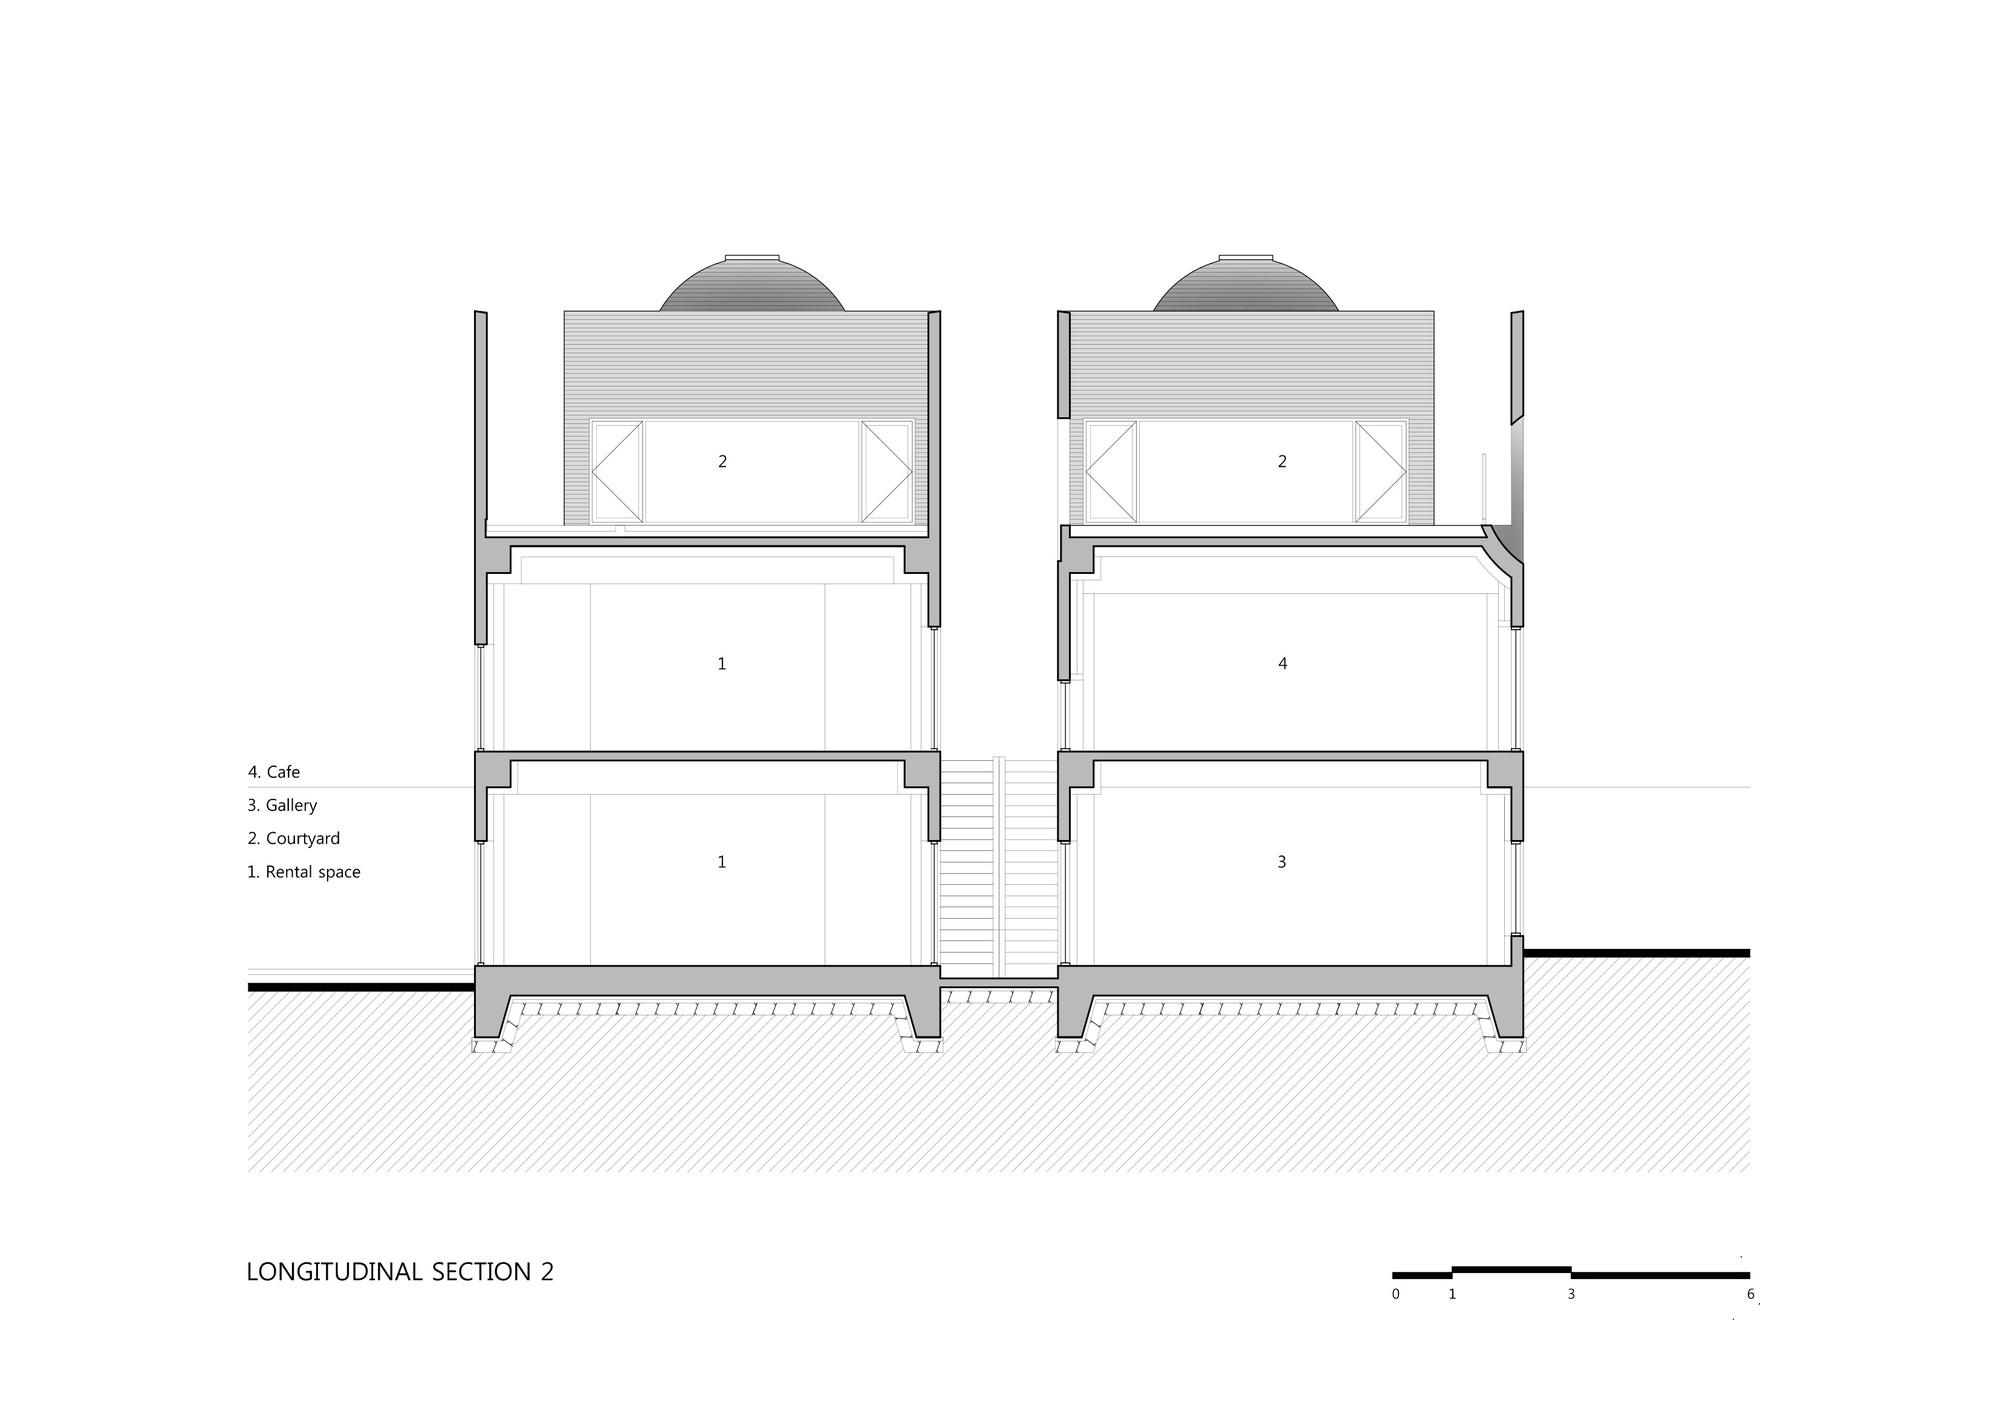 41_Section_02.jpg